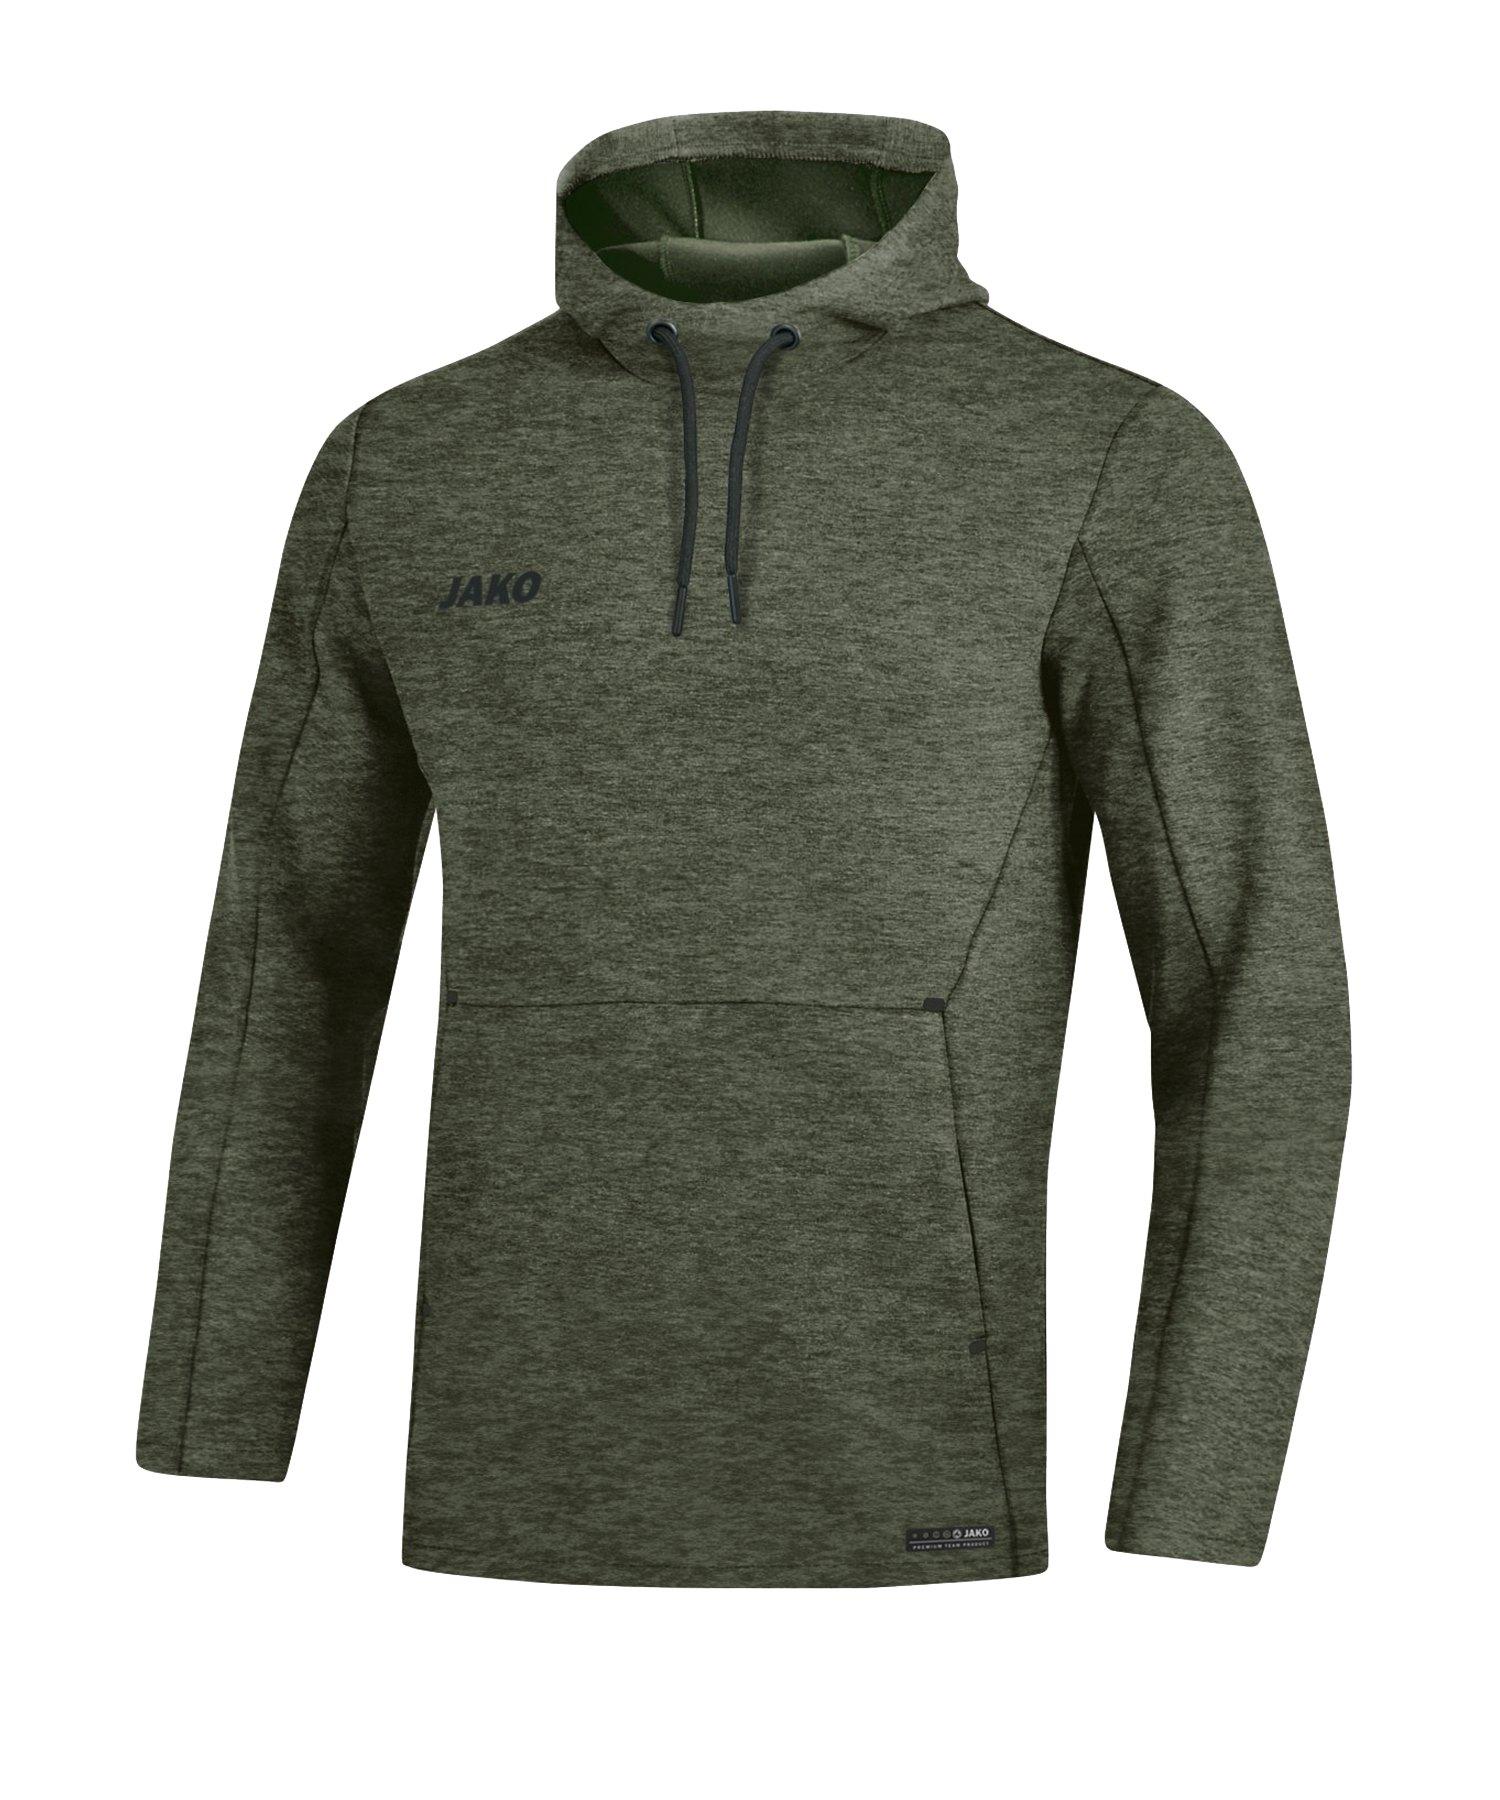 Jako Premium Basic Kapuzensweatshirt Khaki F28 - khaki